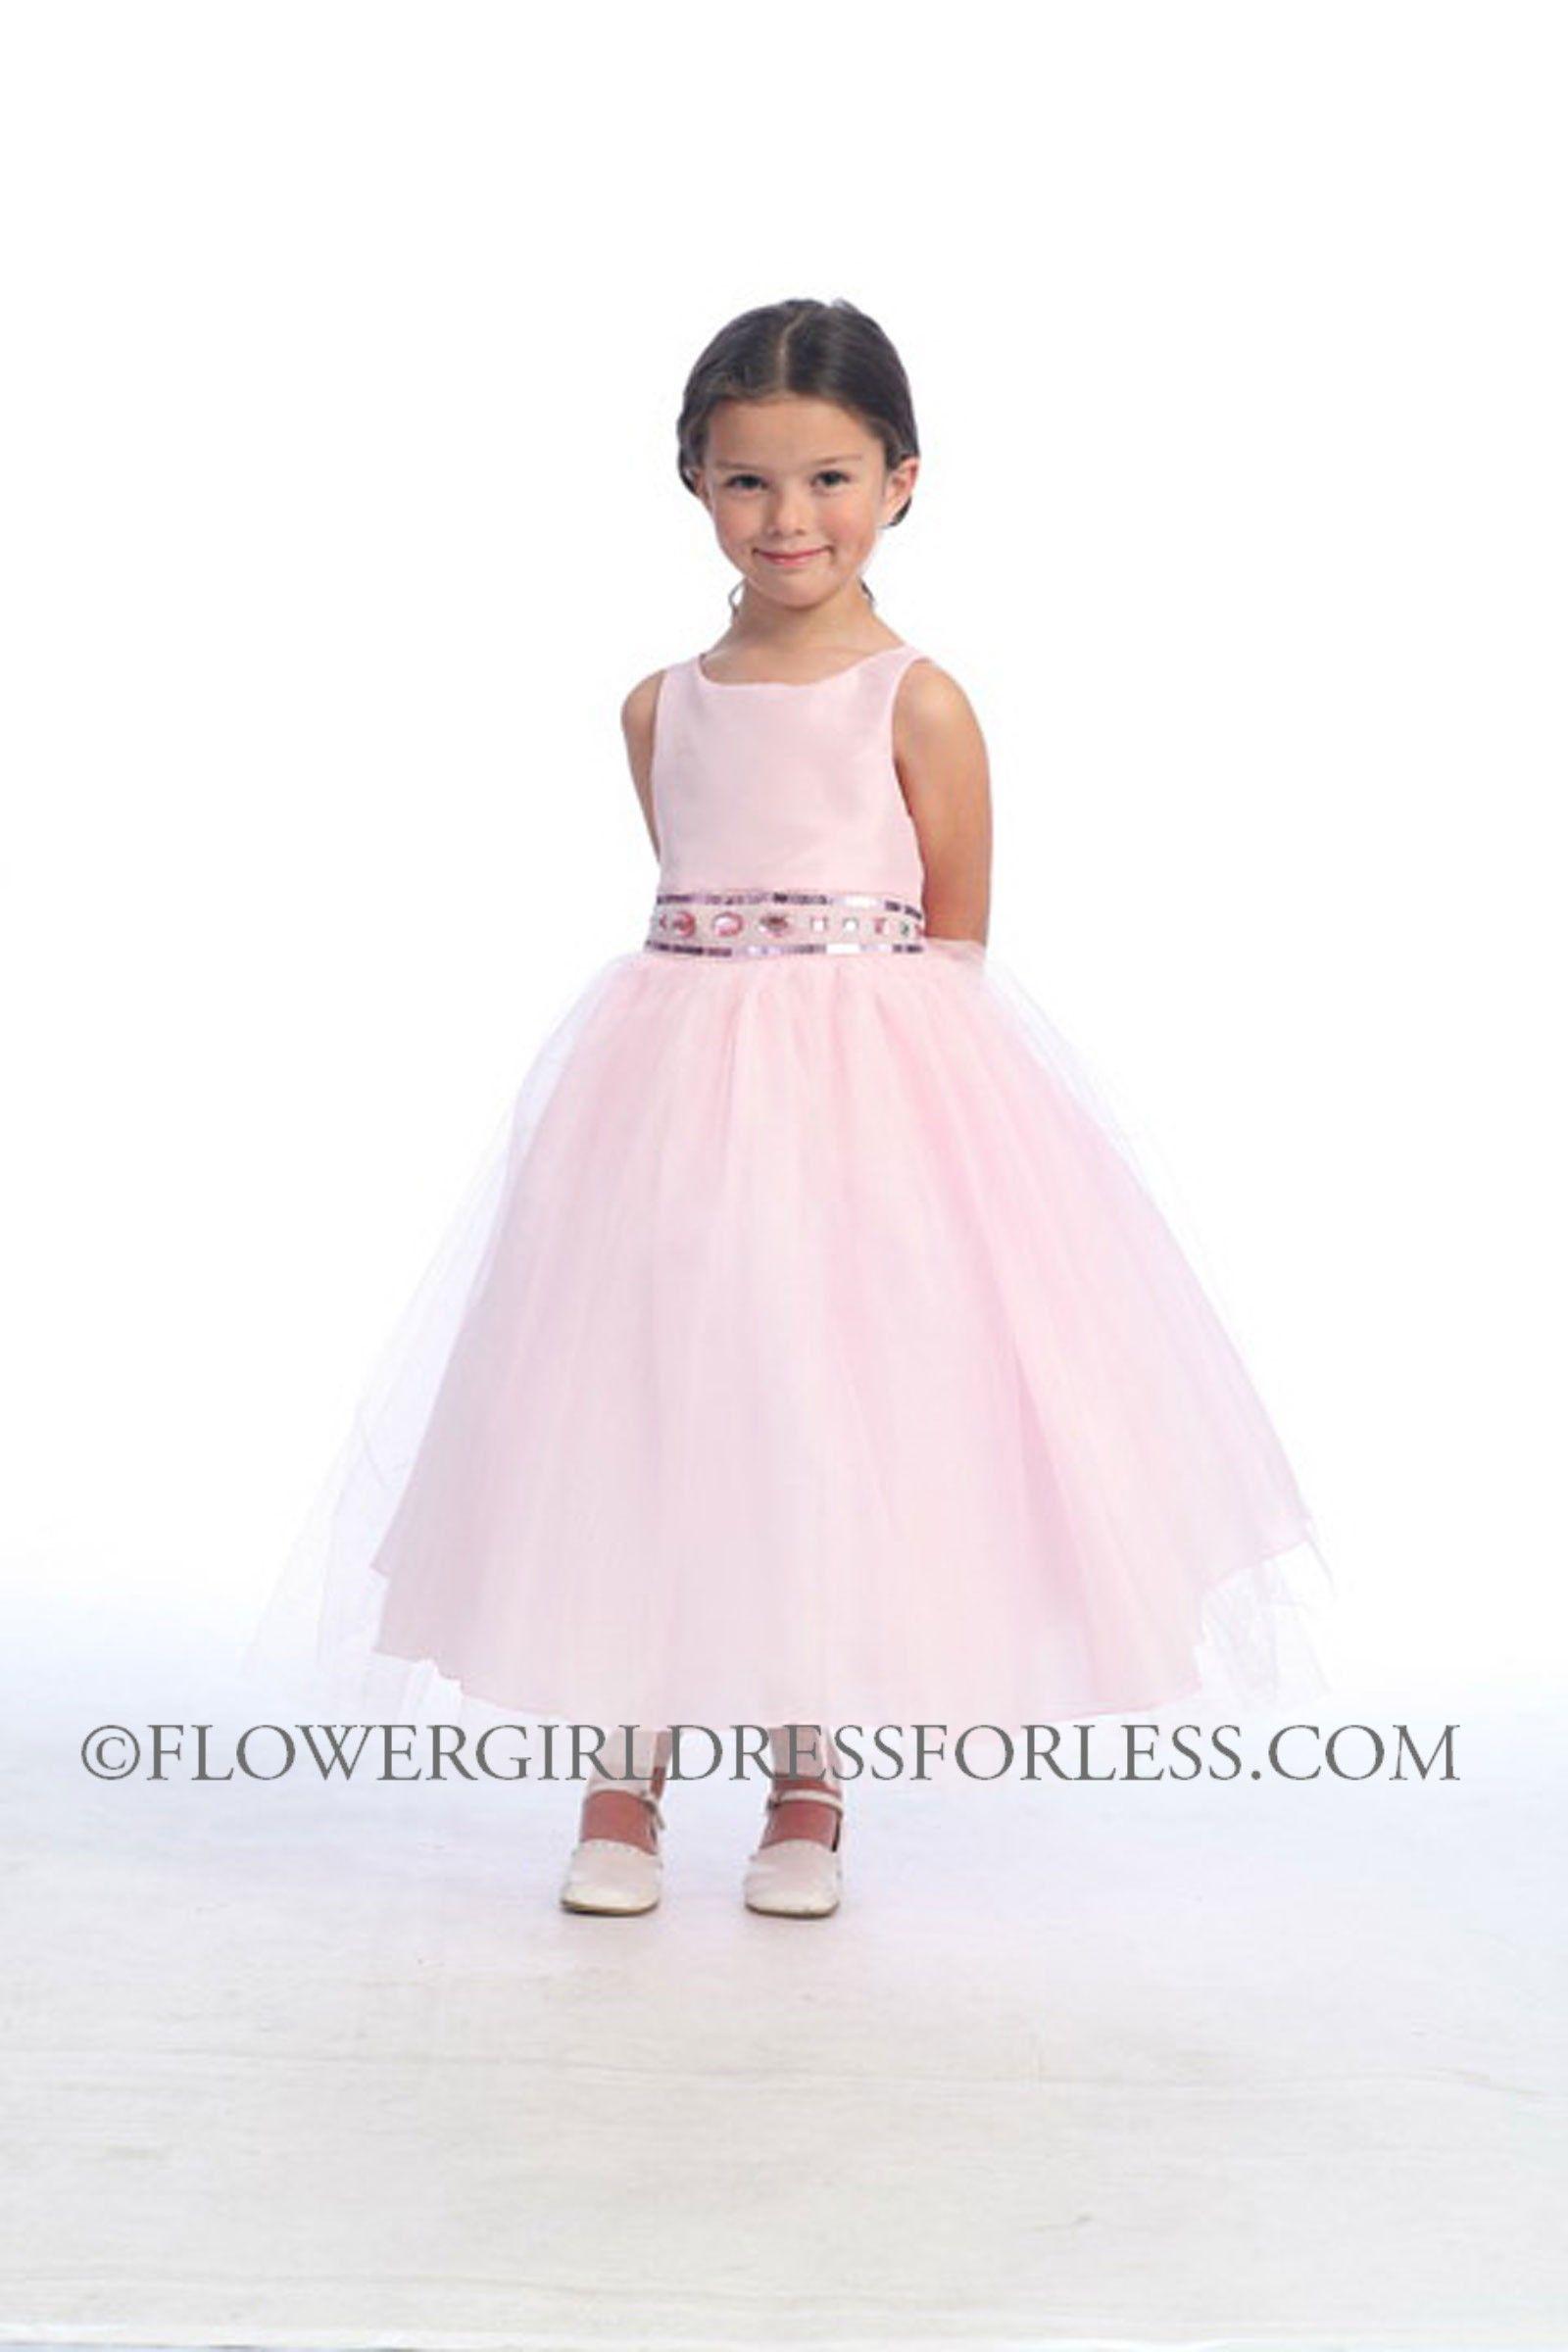 17 Best images about Flower girl dresses on Pinterest - Tulle ...